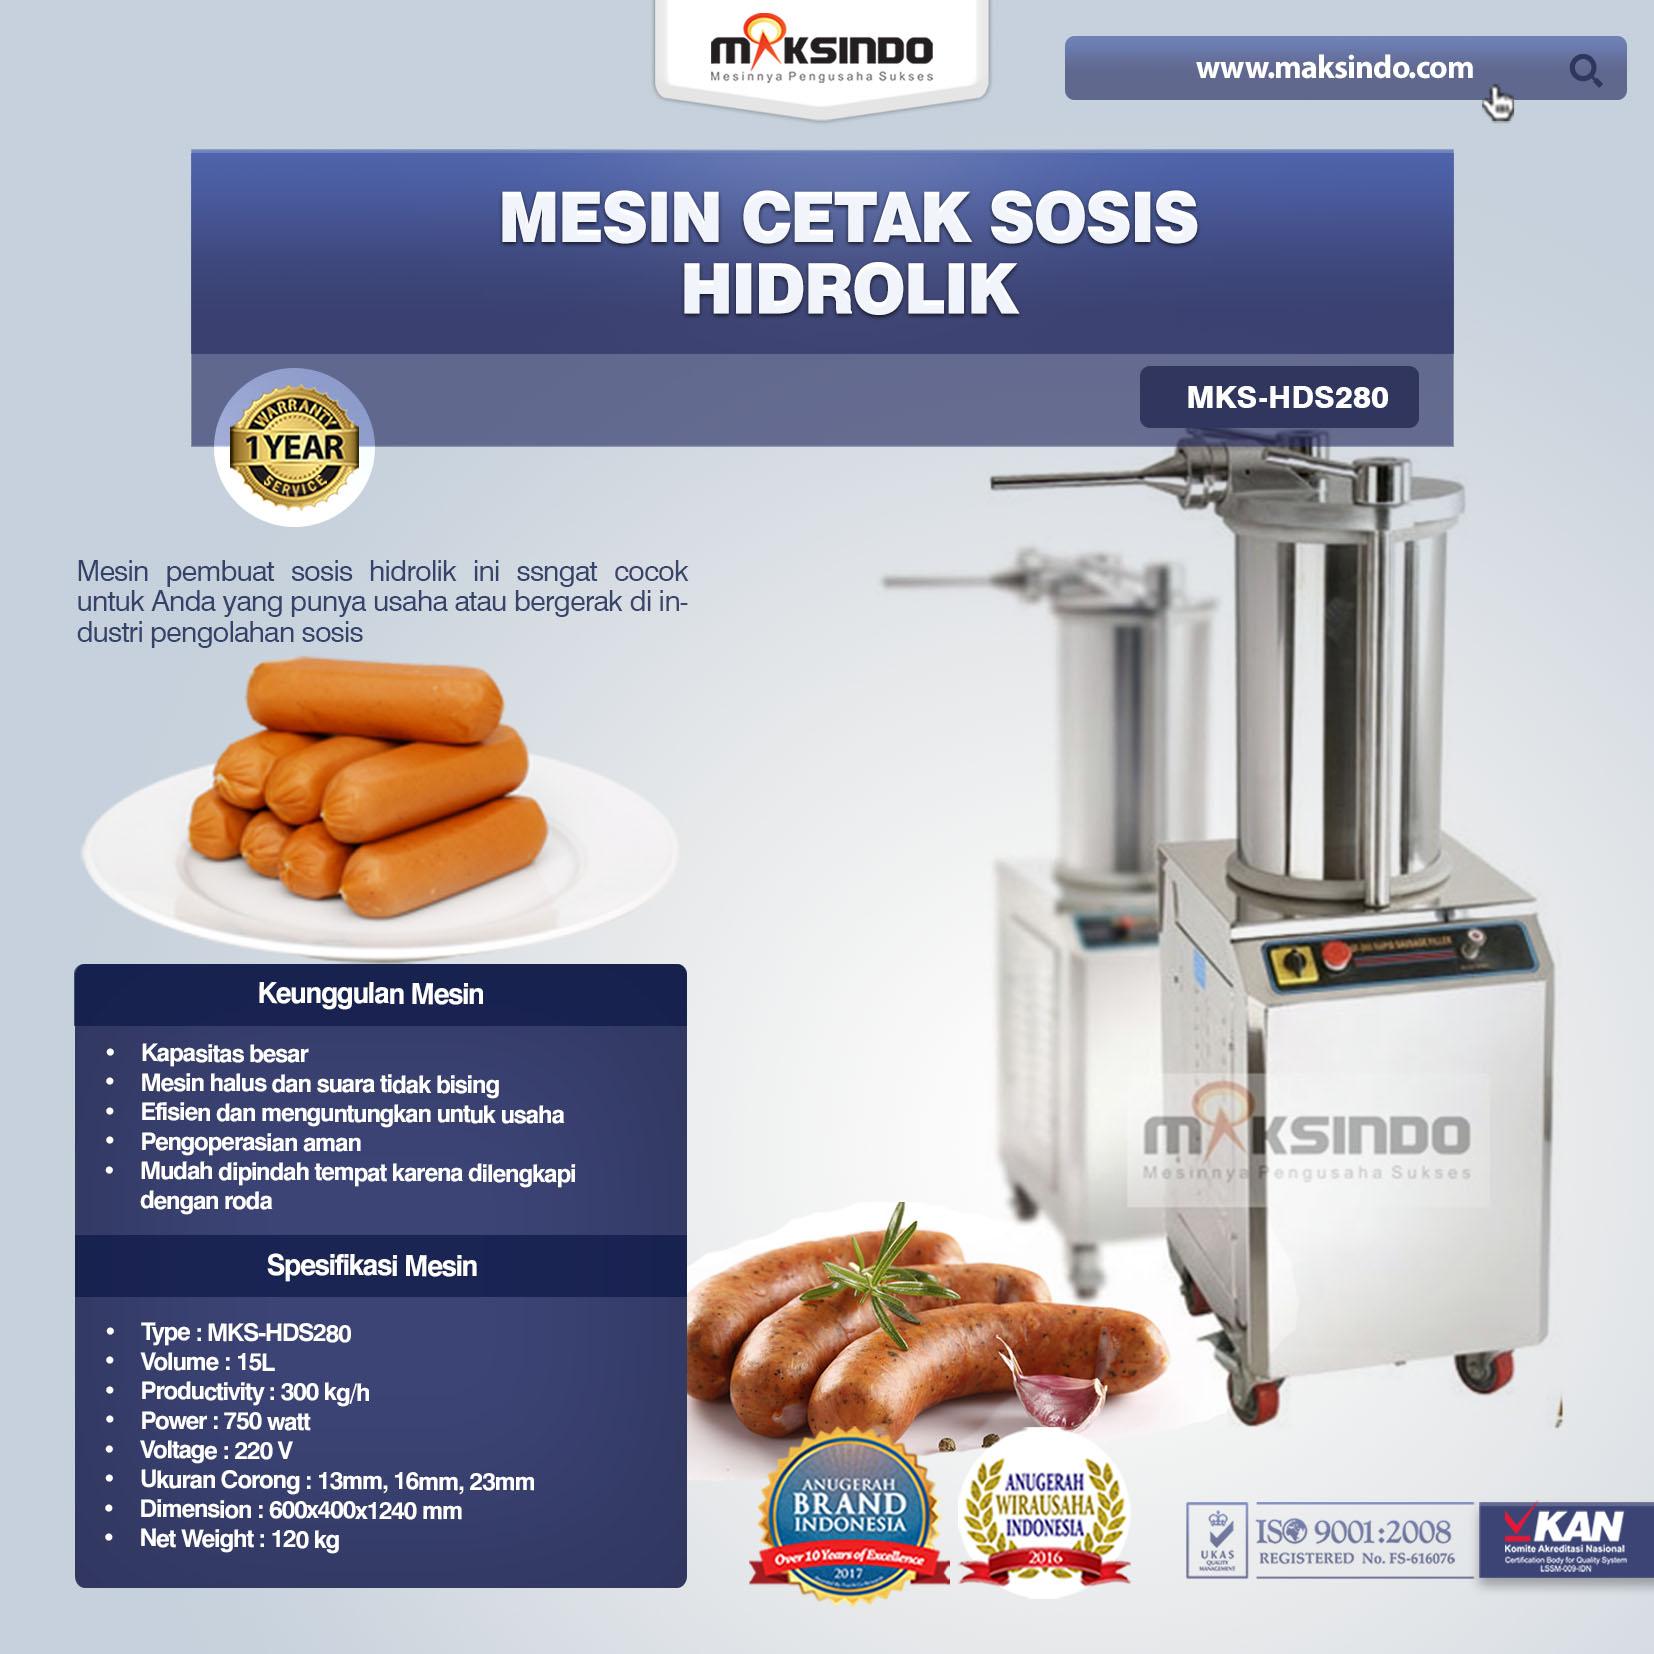 Jual Mesin Cetak Sosis Hidrolik MKS-HDS280 di Medan